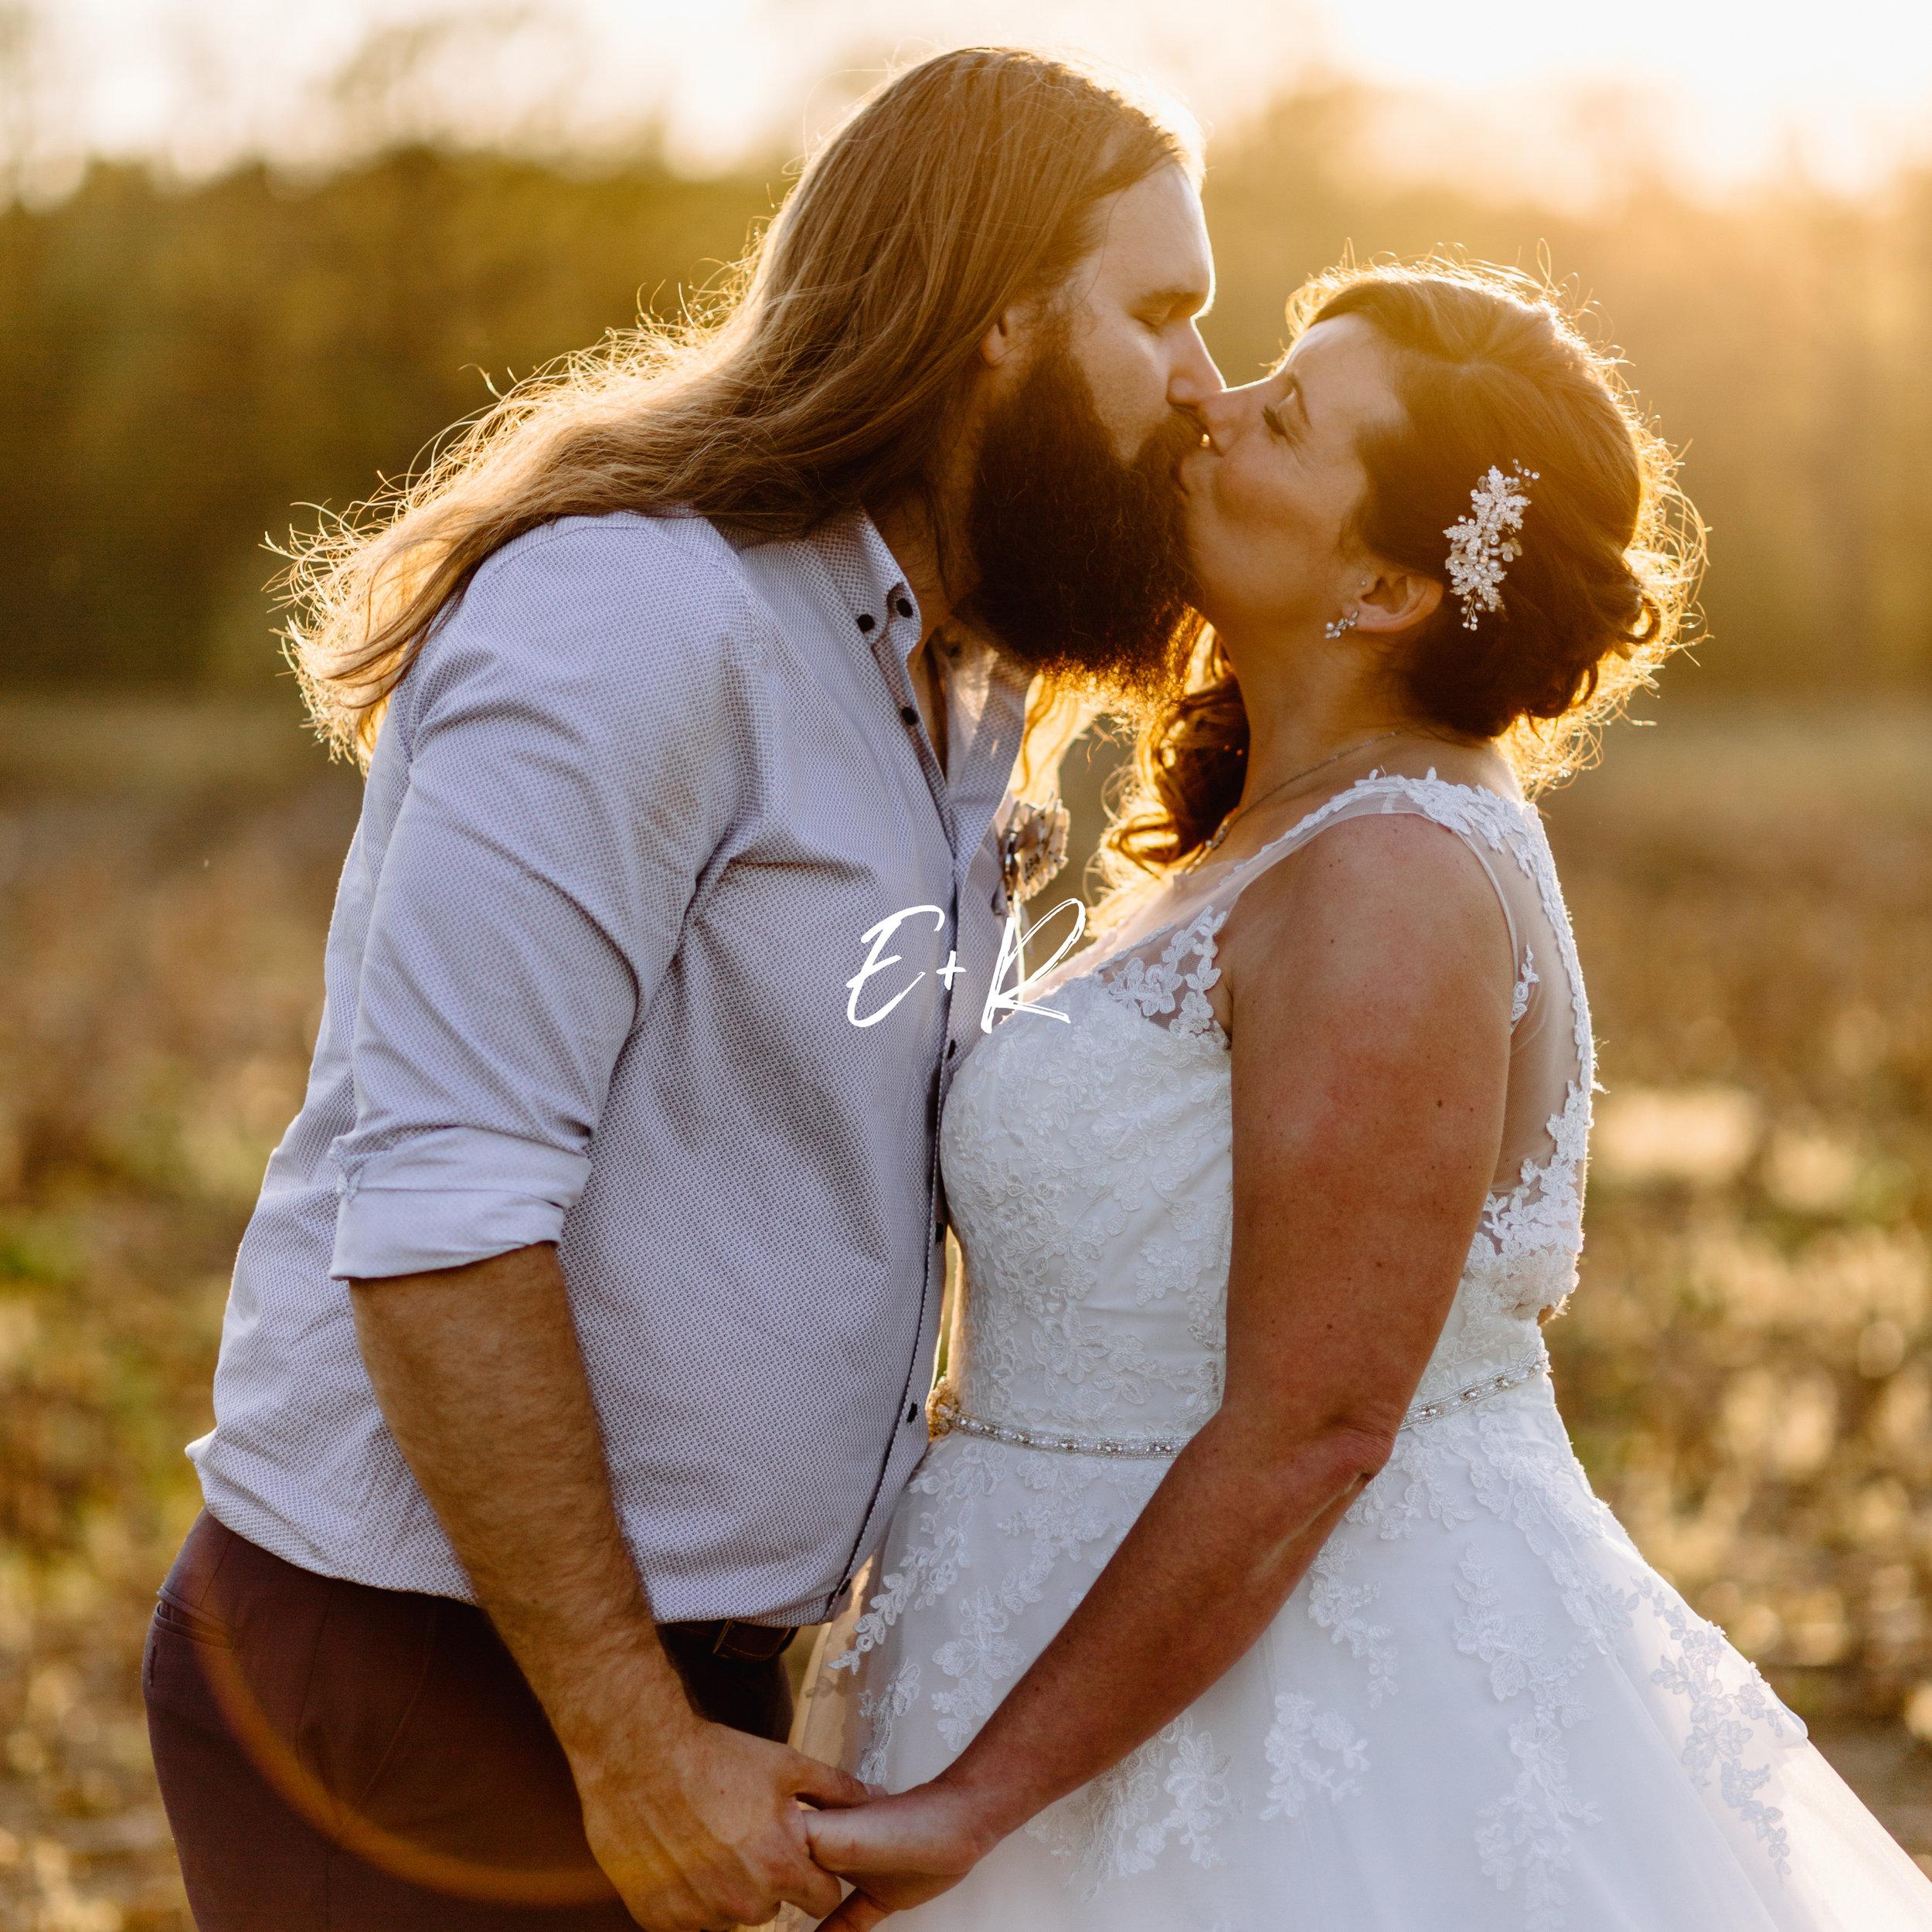 huwelijksfotografie-emma-rik-lisa-helsen-photography-herentals-herenthout-prinsenhof-internationaal-huwelijk-huwelijksfotograaf